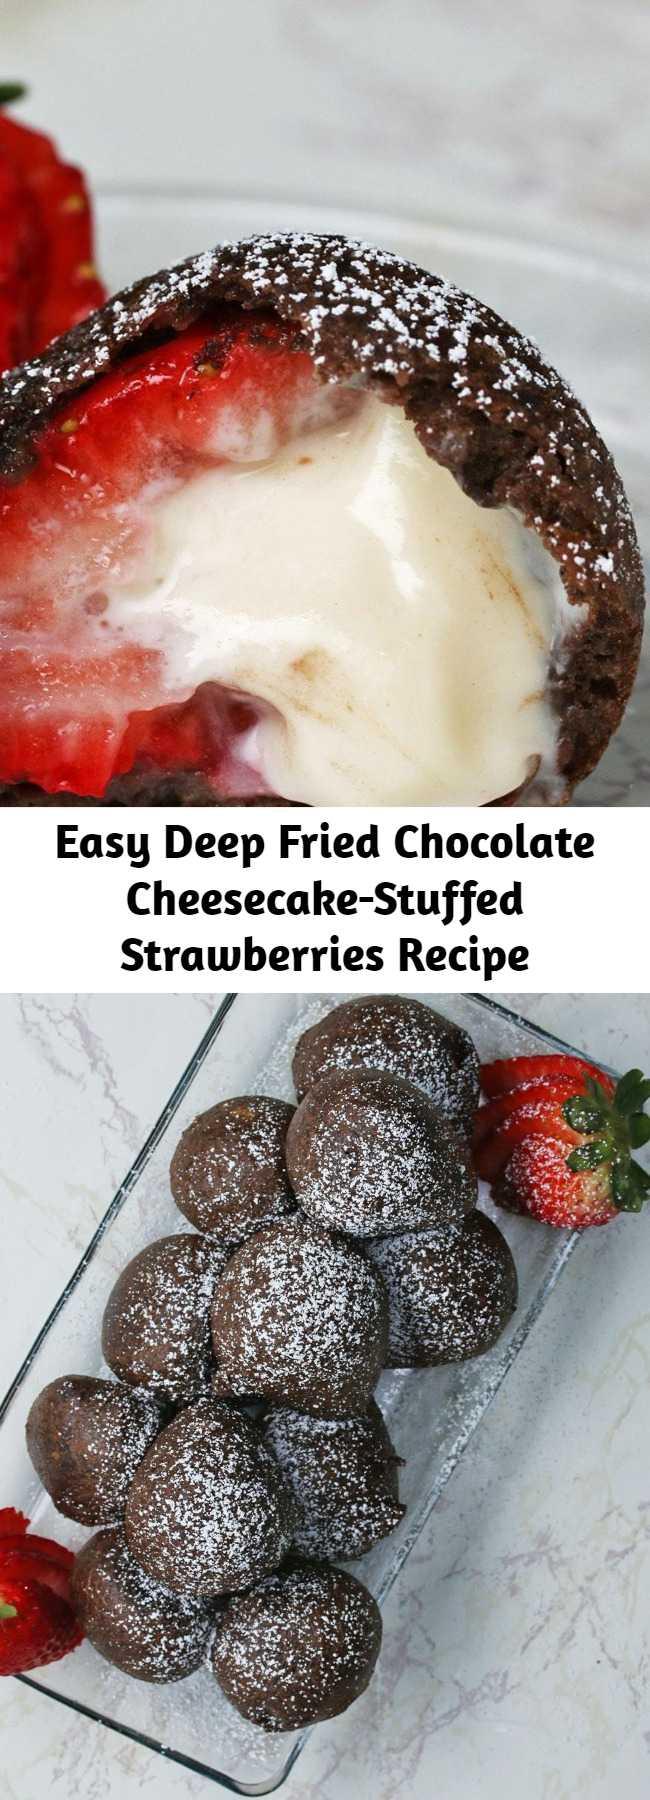 Easy Deep Fried Chocolate Cheesecake-Stuffed Strawberries Recipe